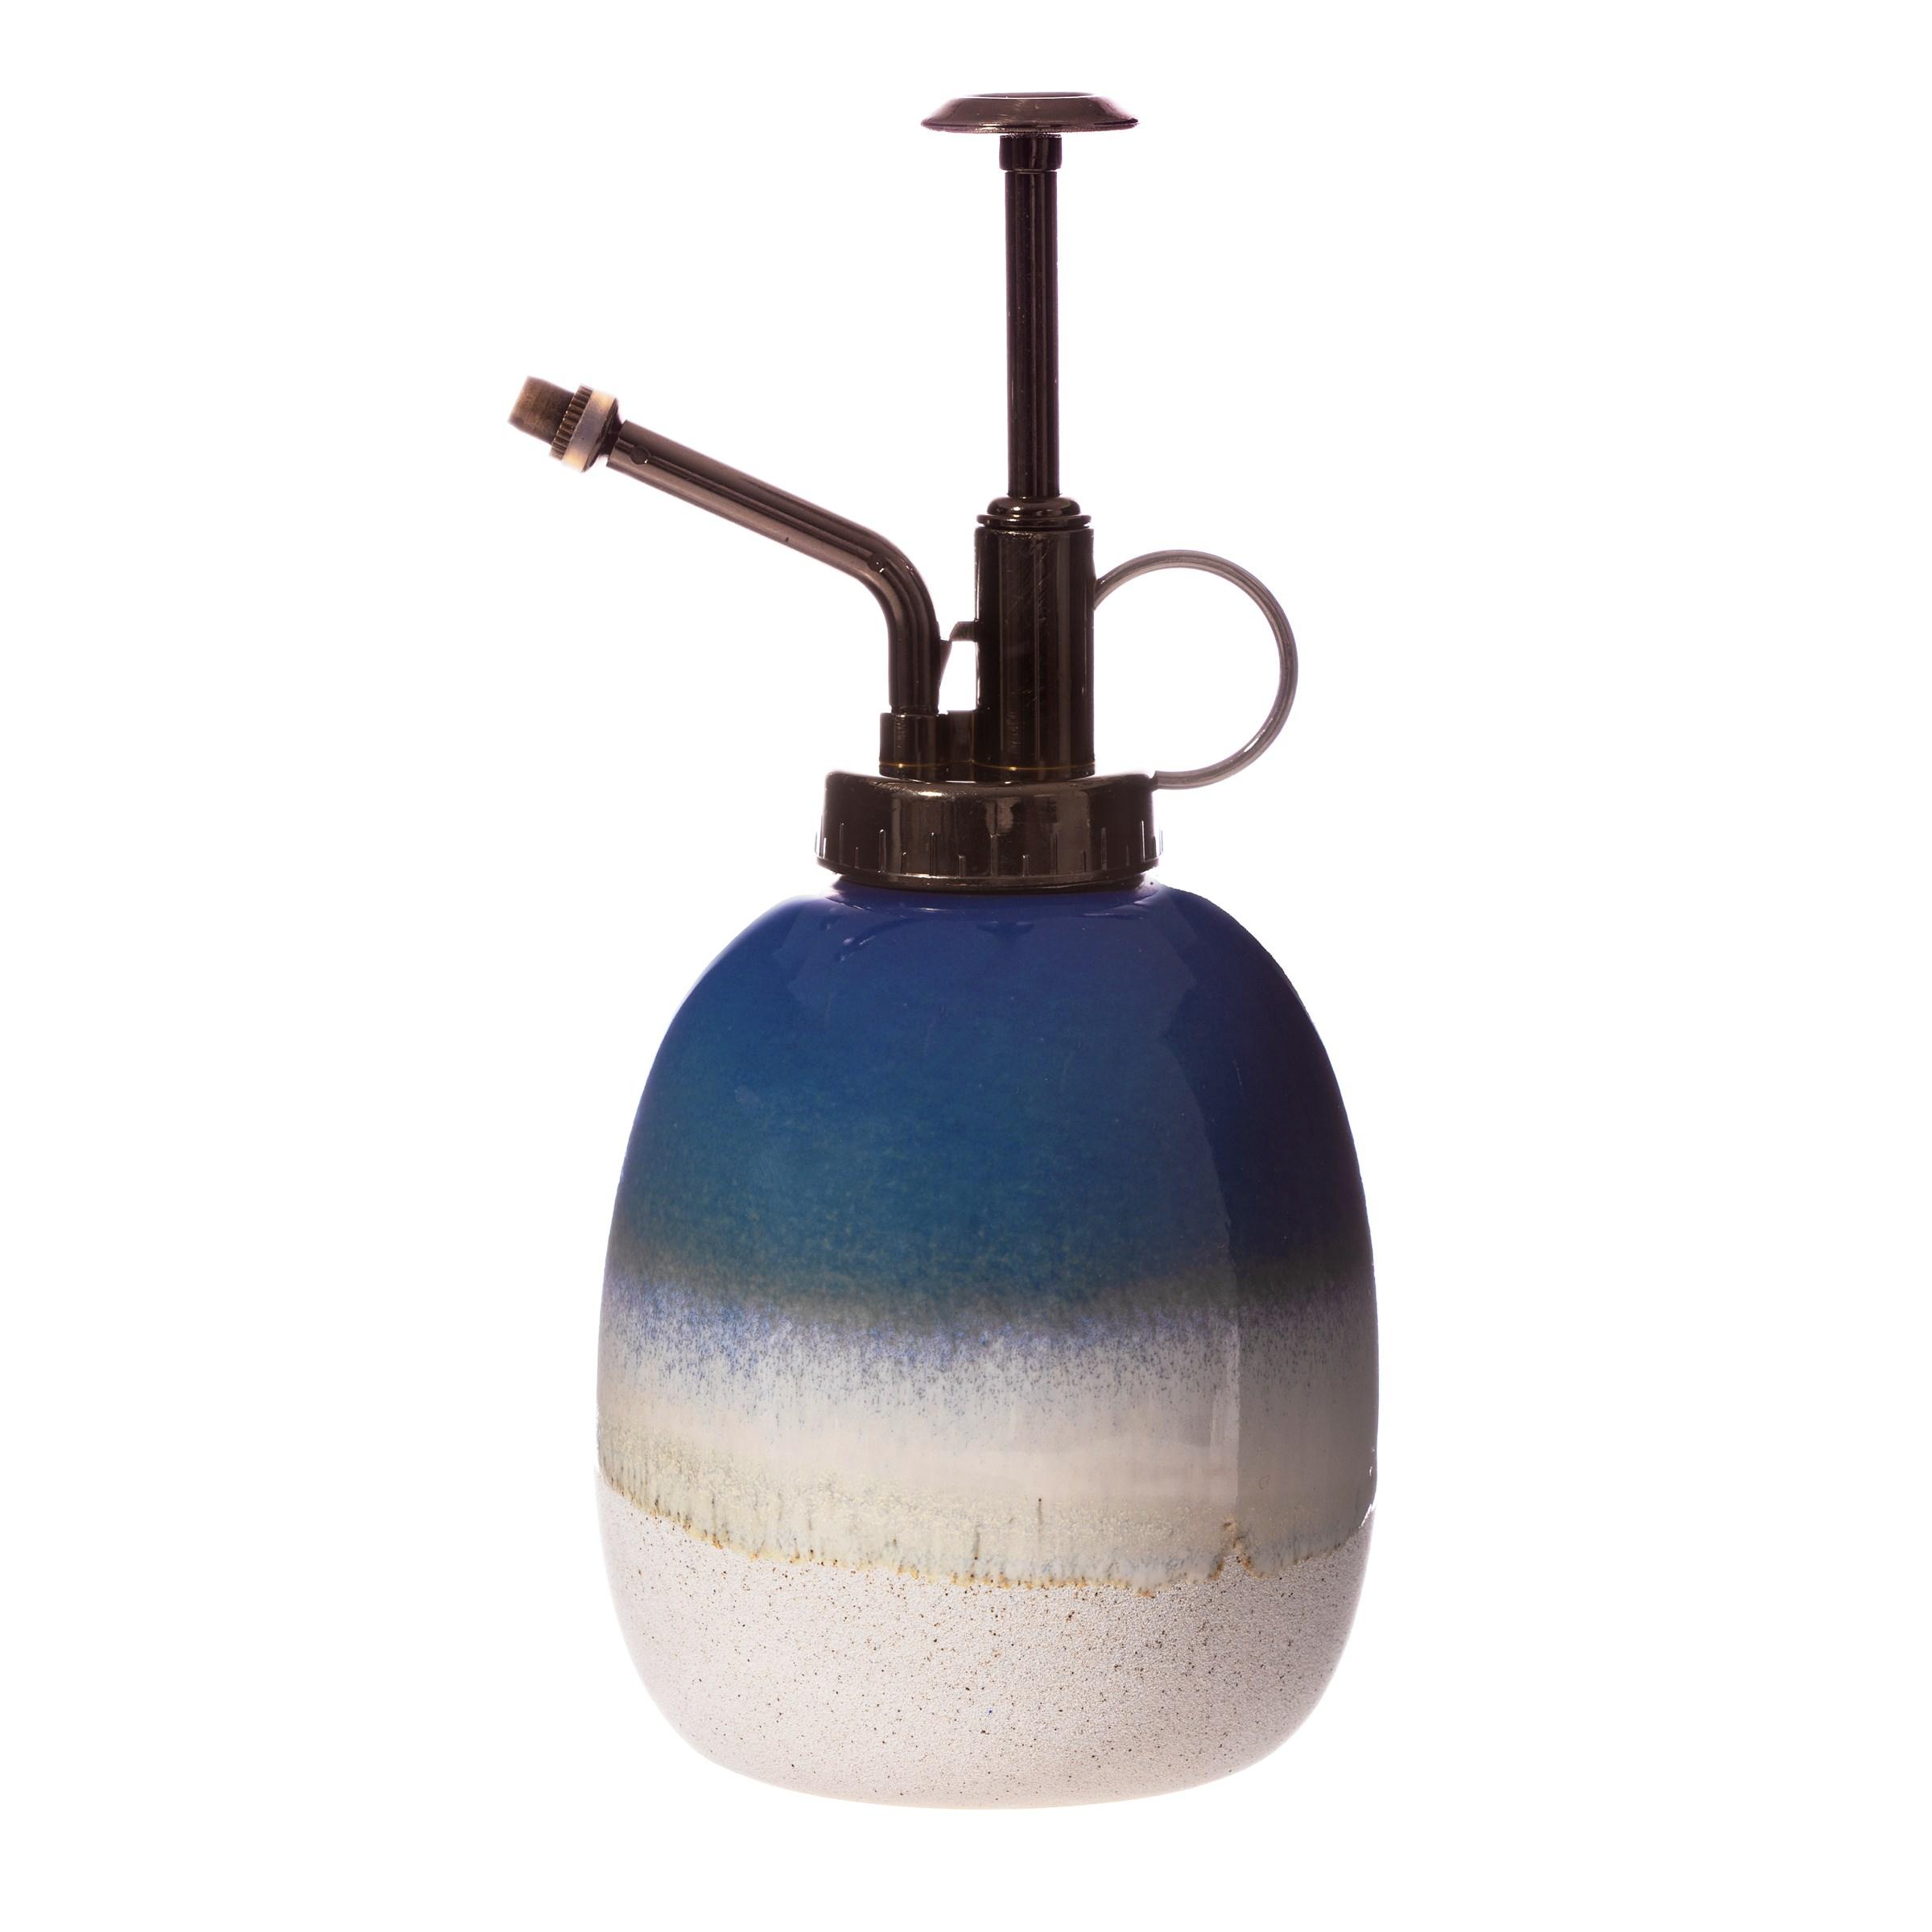 Mojave Glaze Blue Ceramic Plant Mister